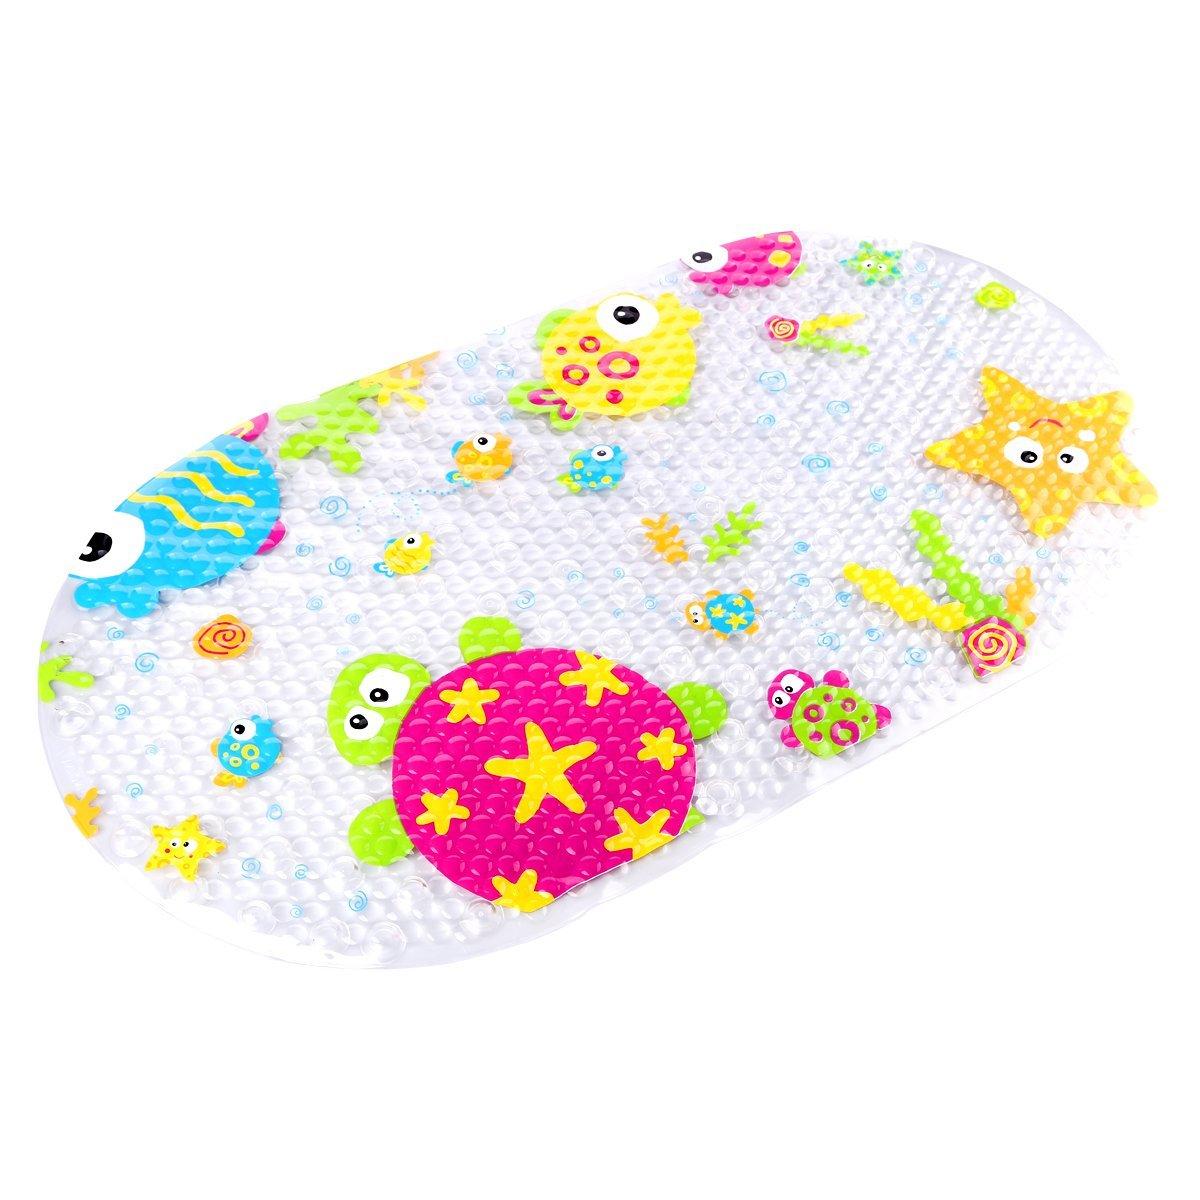 Topsky Baby Non-slip Bath Mat Anti-Bacterial Bathtub Mat